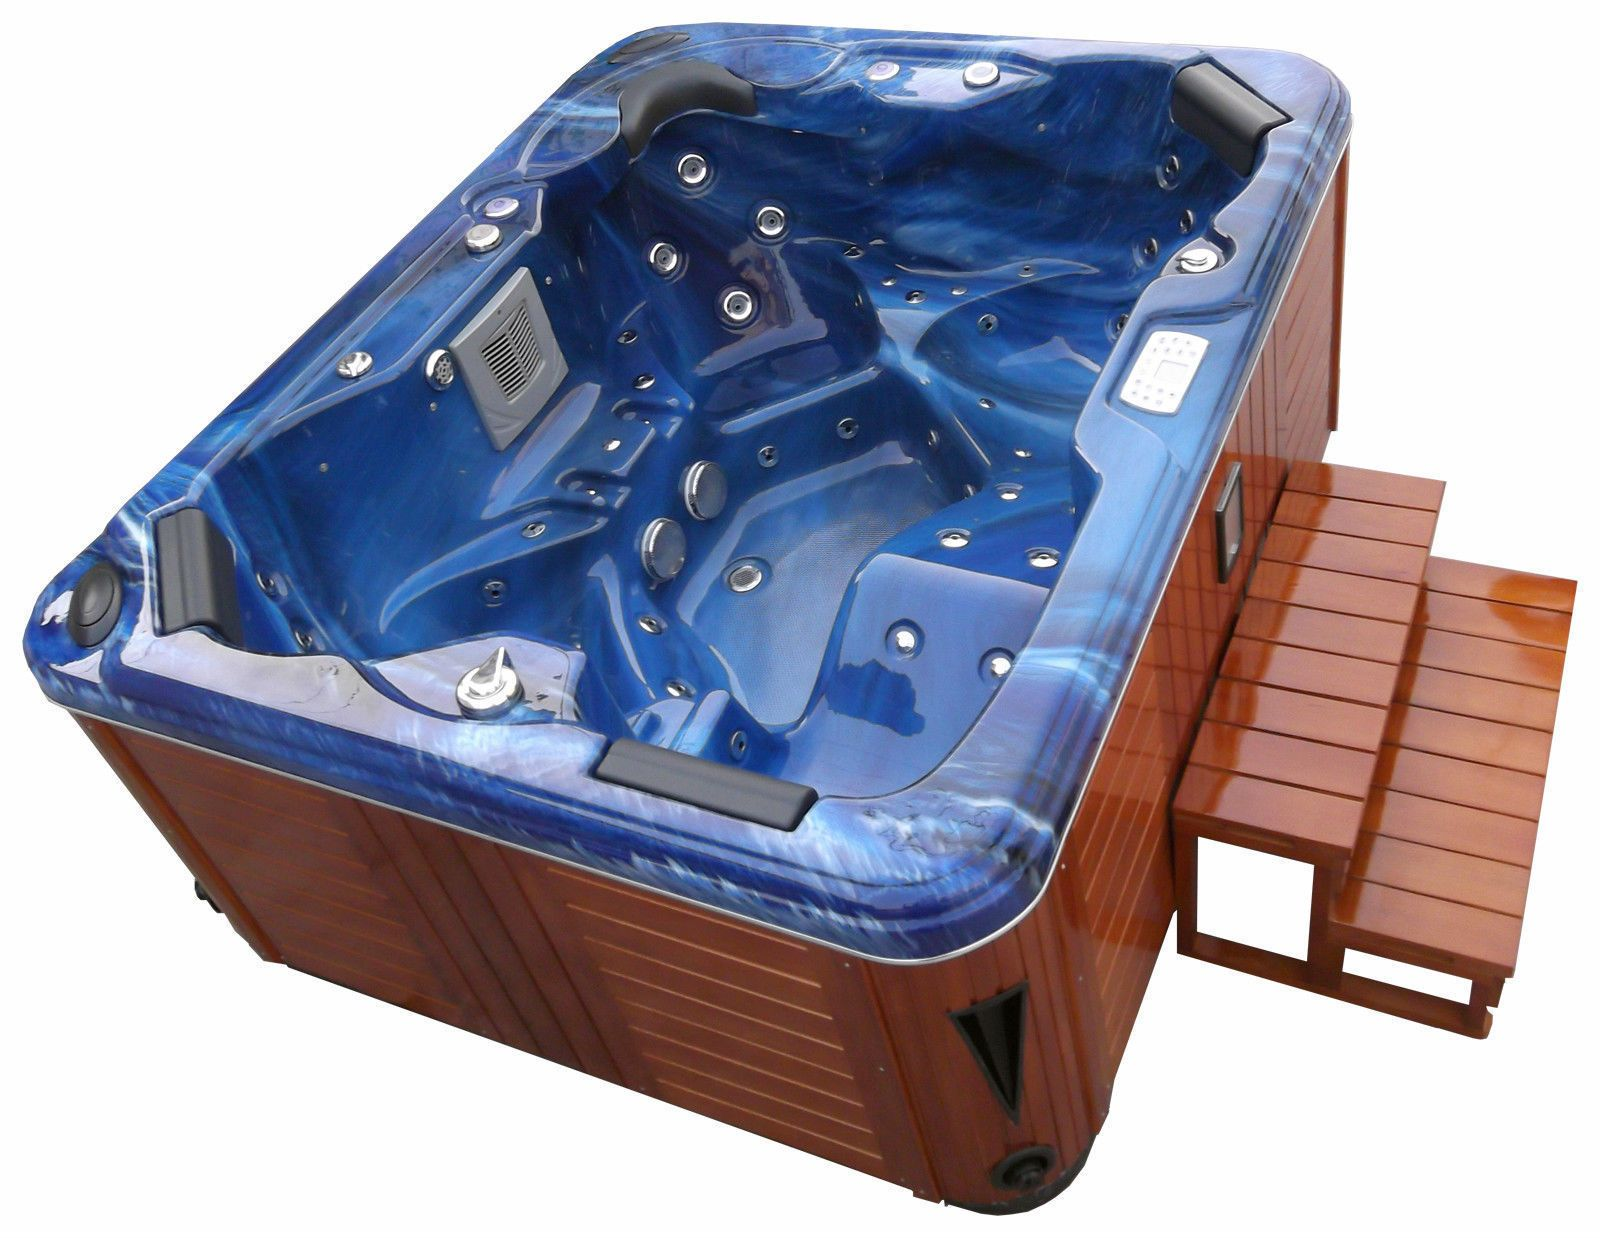 Hot Tubs Hot Tub Spa - BRAND NEW 2015 design USA AMERICANO ACRYLIC ...